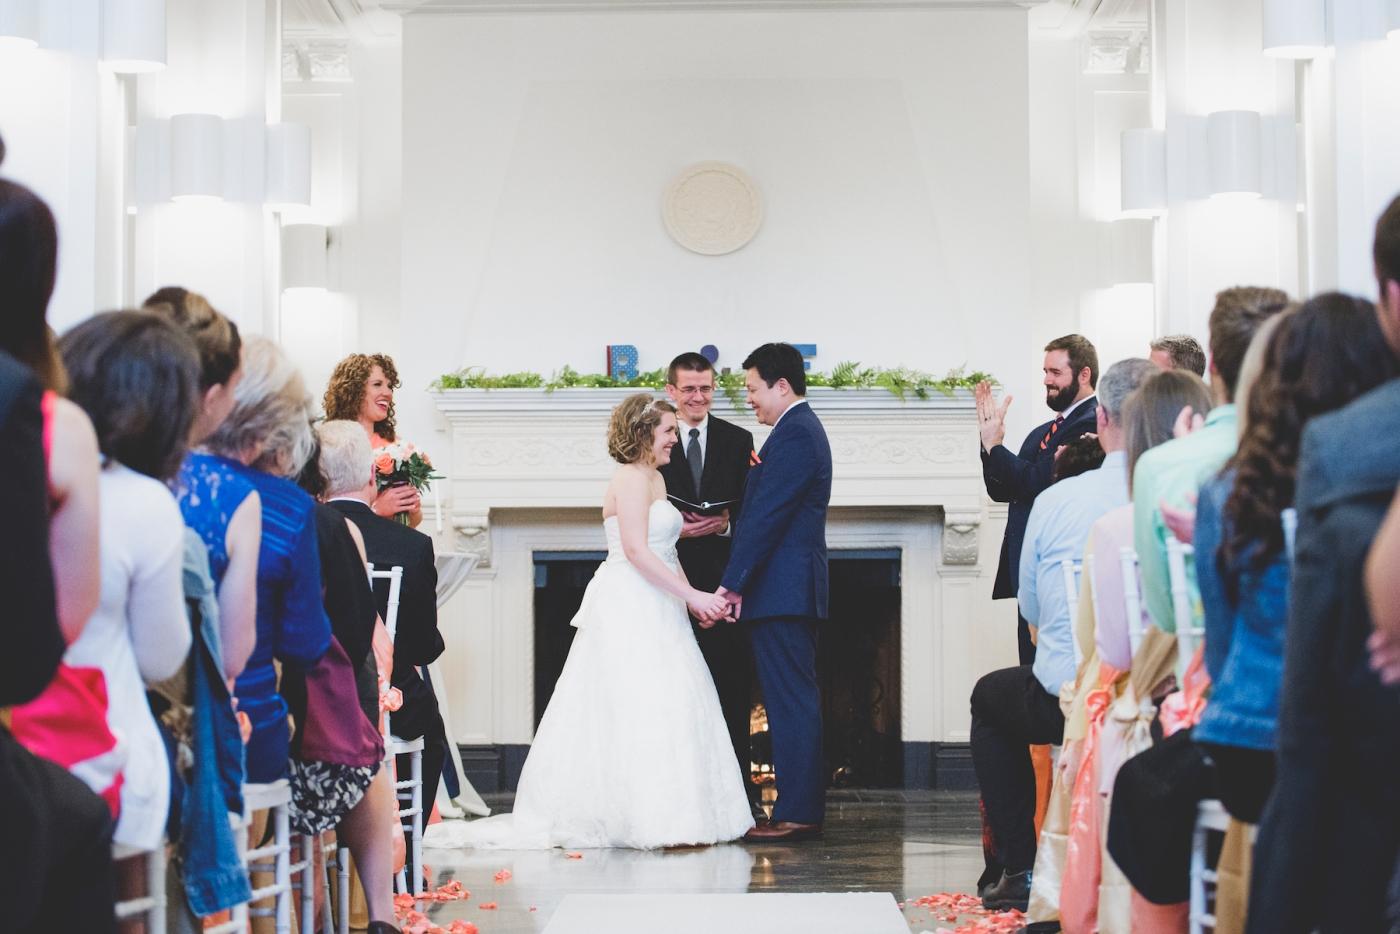 DSC_2712Everett_Wedding_Ballroom_Jane_Speleers_photography_Rachel_and_Edmund_Ceremony_2017